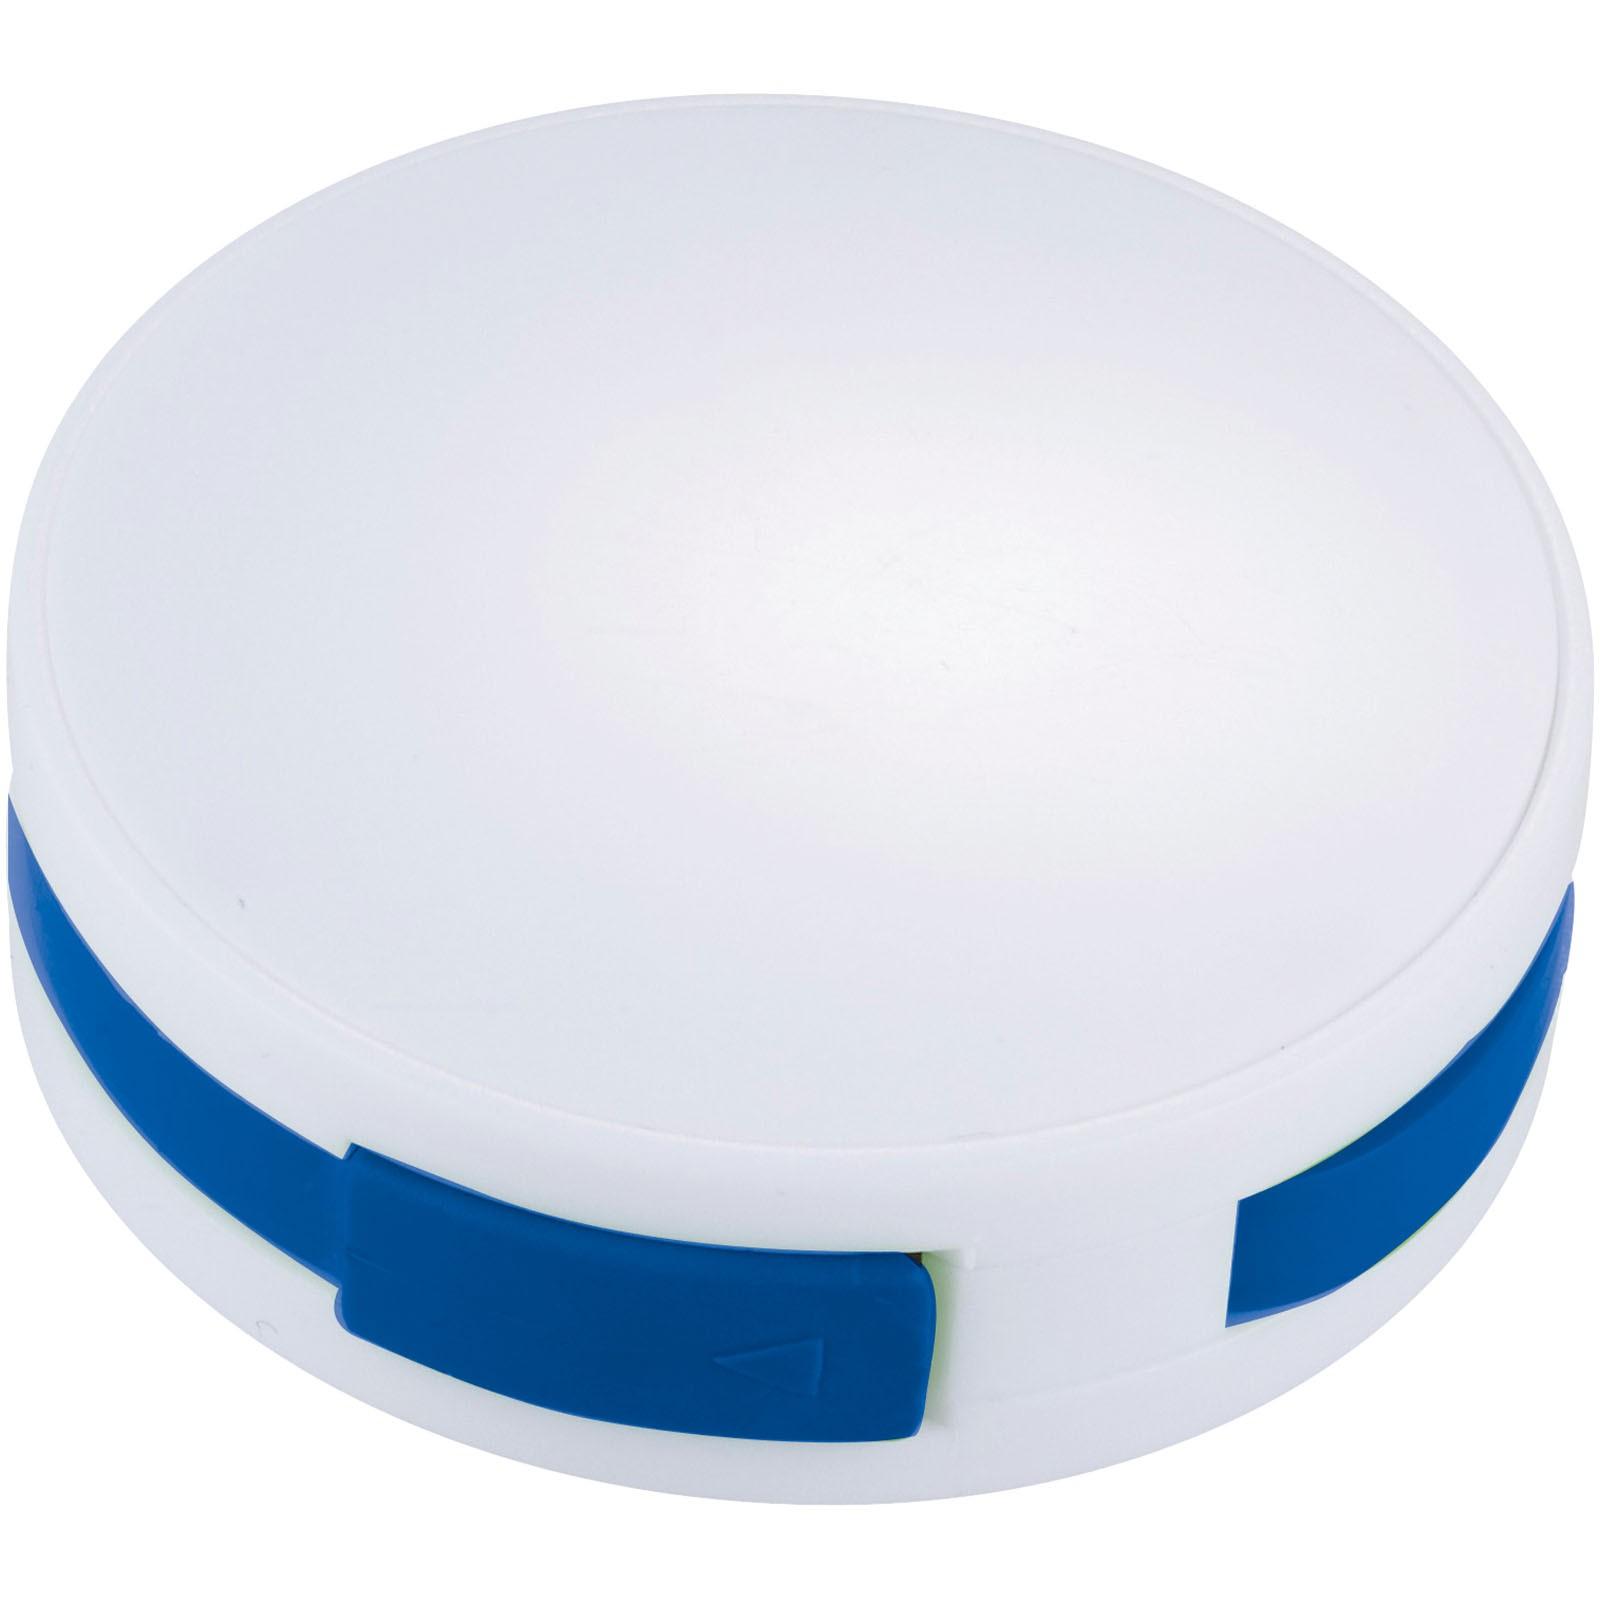 Round 4-port USB hub - White / Royal blue